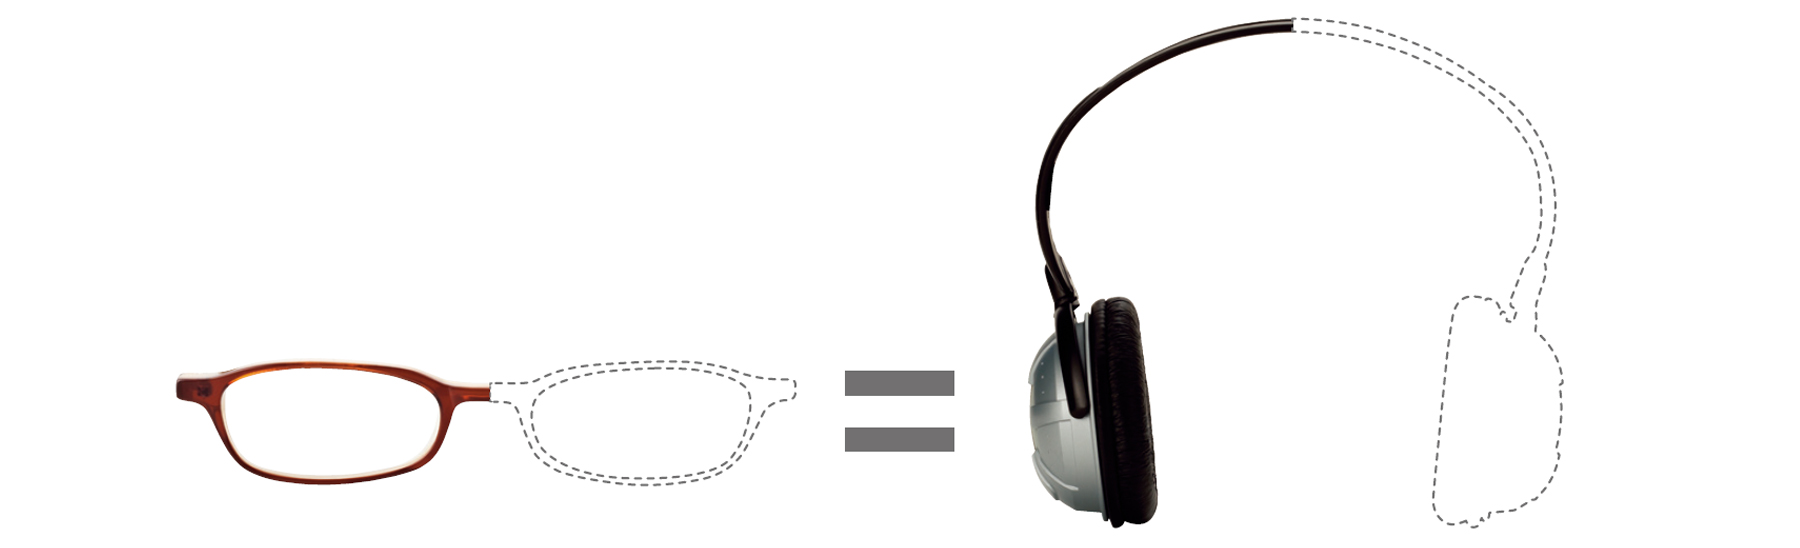 JP_primax-hearingloss_binaural_950px